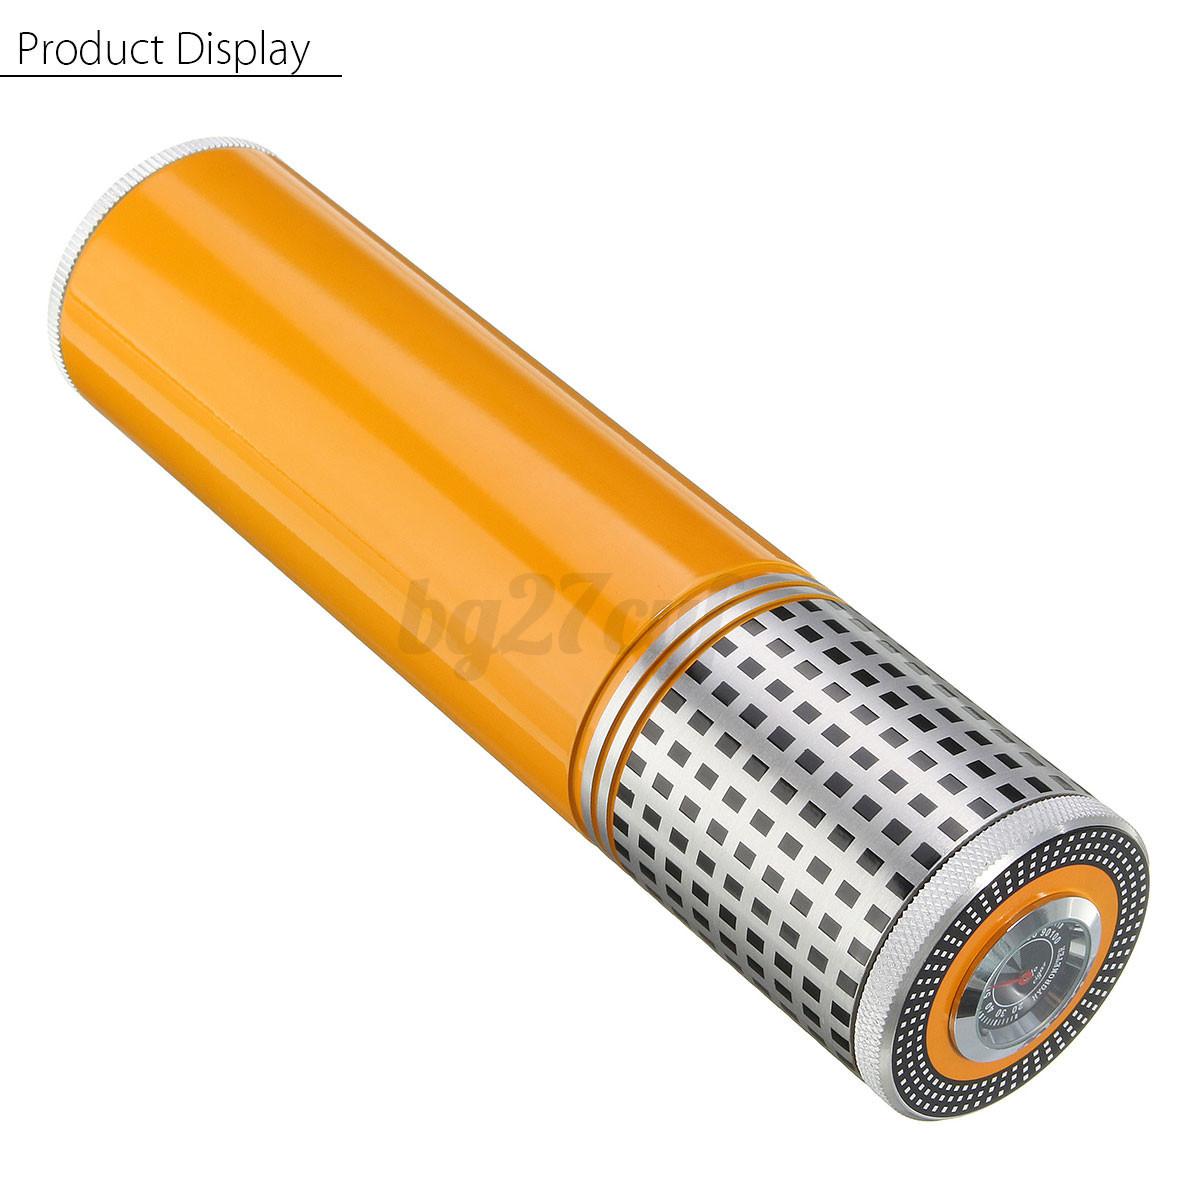 Humidor Humidifier Hydrating Travel Storage Tube W/ Hygrometer AU #C67505